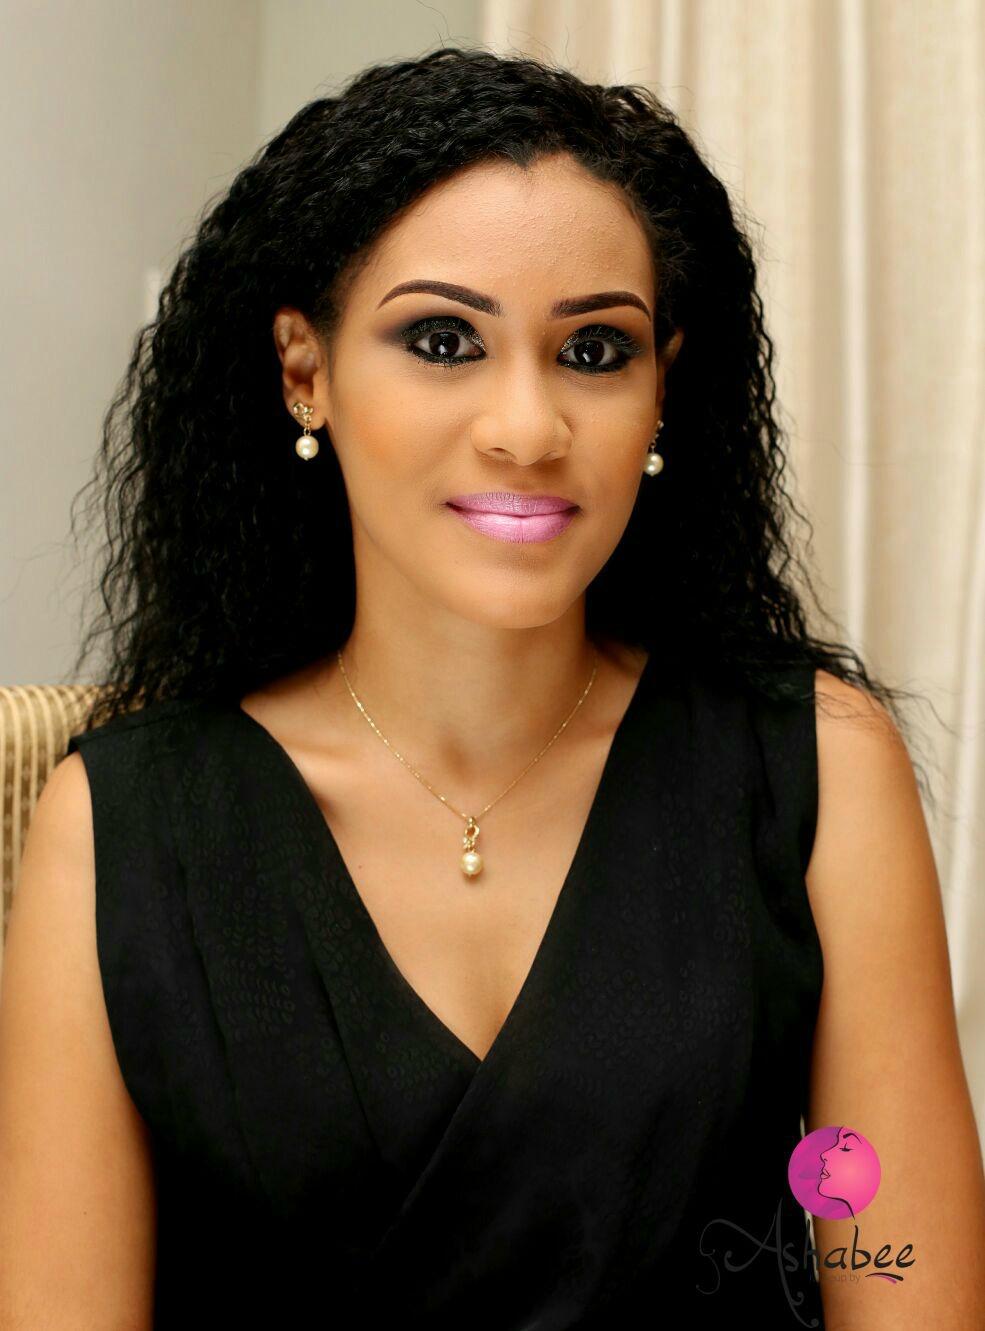 http://www.bellanaija.com/wp-content/uploads/2015/10/Juliet-Ibrahims-Shattered-Romance-Nigeria-Premiere74.jpg